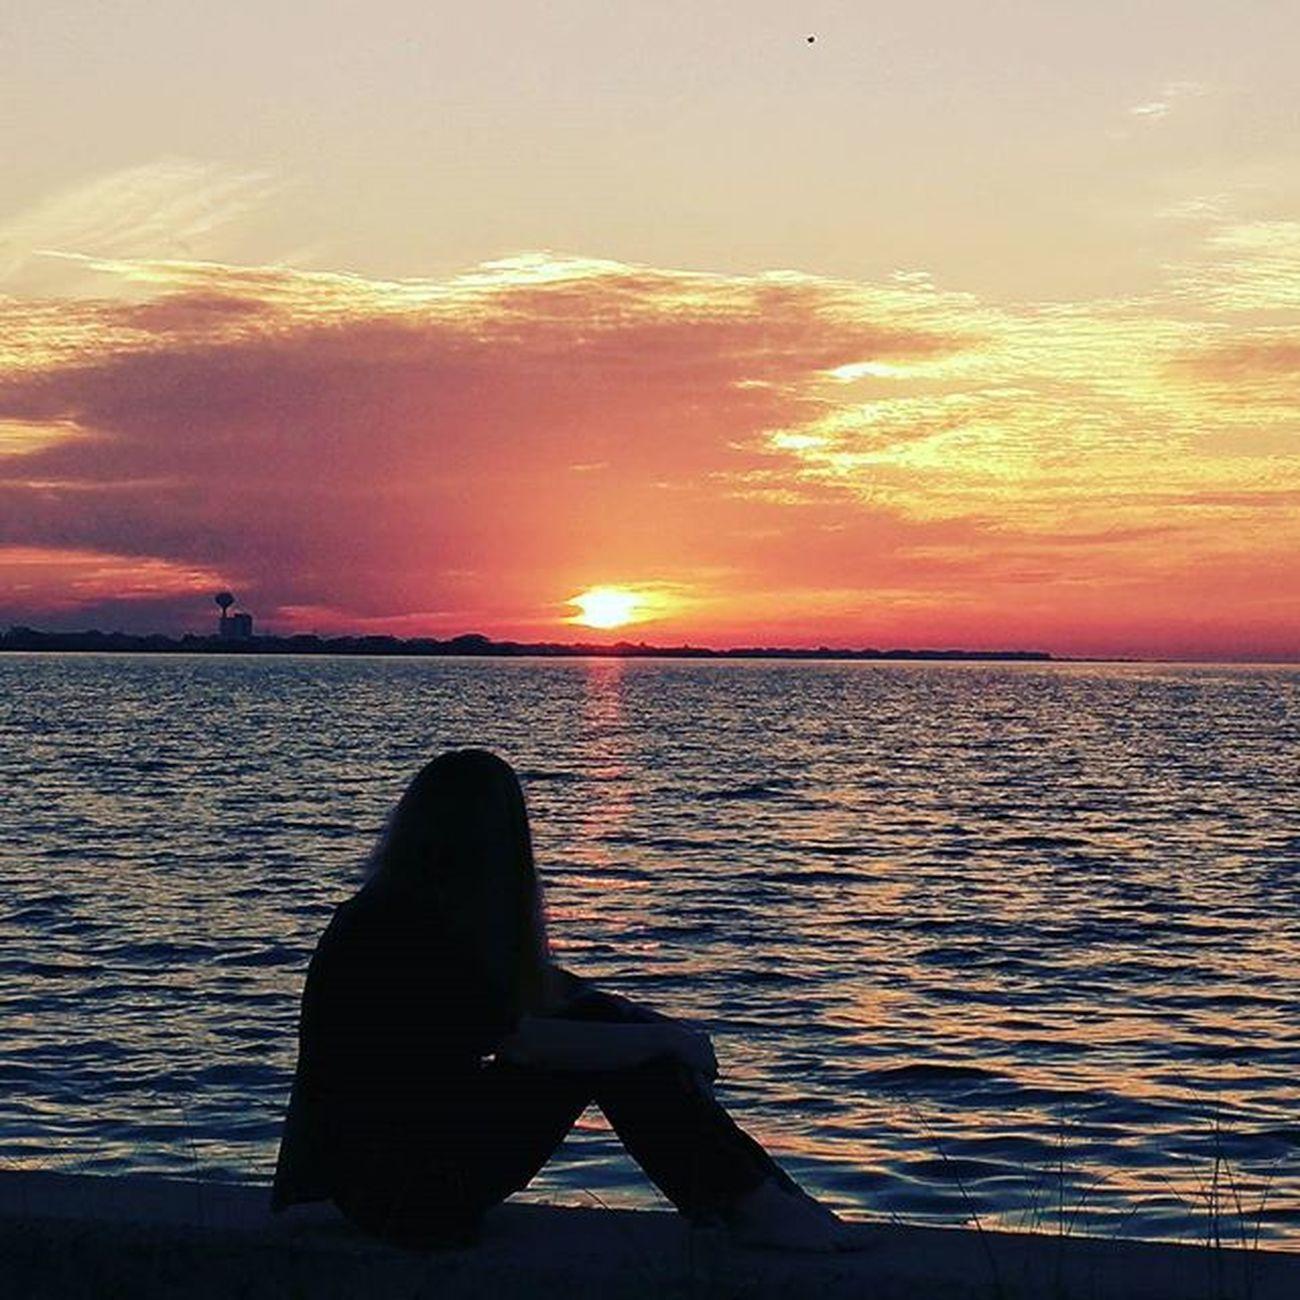 Lost in Thought Sunset Colorful Beautiful Navarrebeach Navarre LoveFl Emeraldcoast Emeraldcoasting HTCOneM9 Htconelife Oneography LoveFl such a beautiful Model @htc @HTCUSA @HTC_UK @HTCelevate @HTCMEA @HTC_IN @HTCIreland @HTCCanada @HTCMalaysia @htcsouthasia @htcfrance TeamHTC @sharealittlesunshine @pureflorida Beachlife Reflection